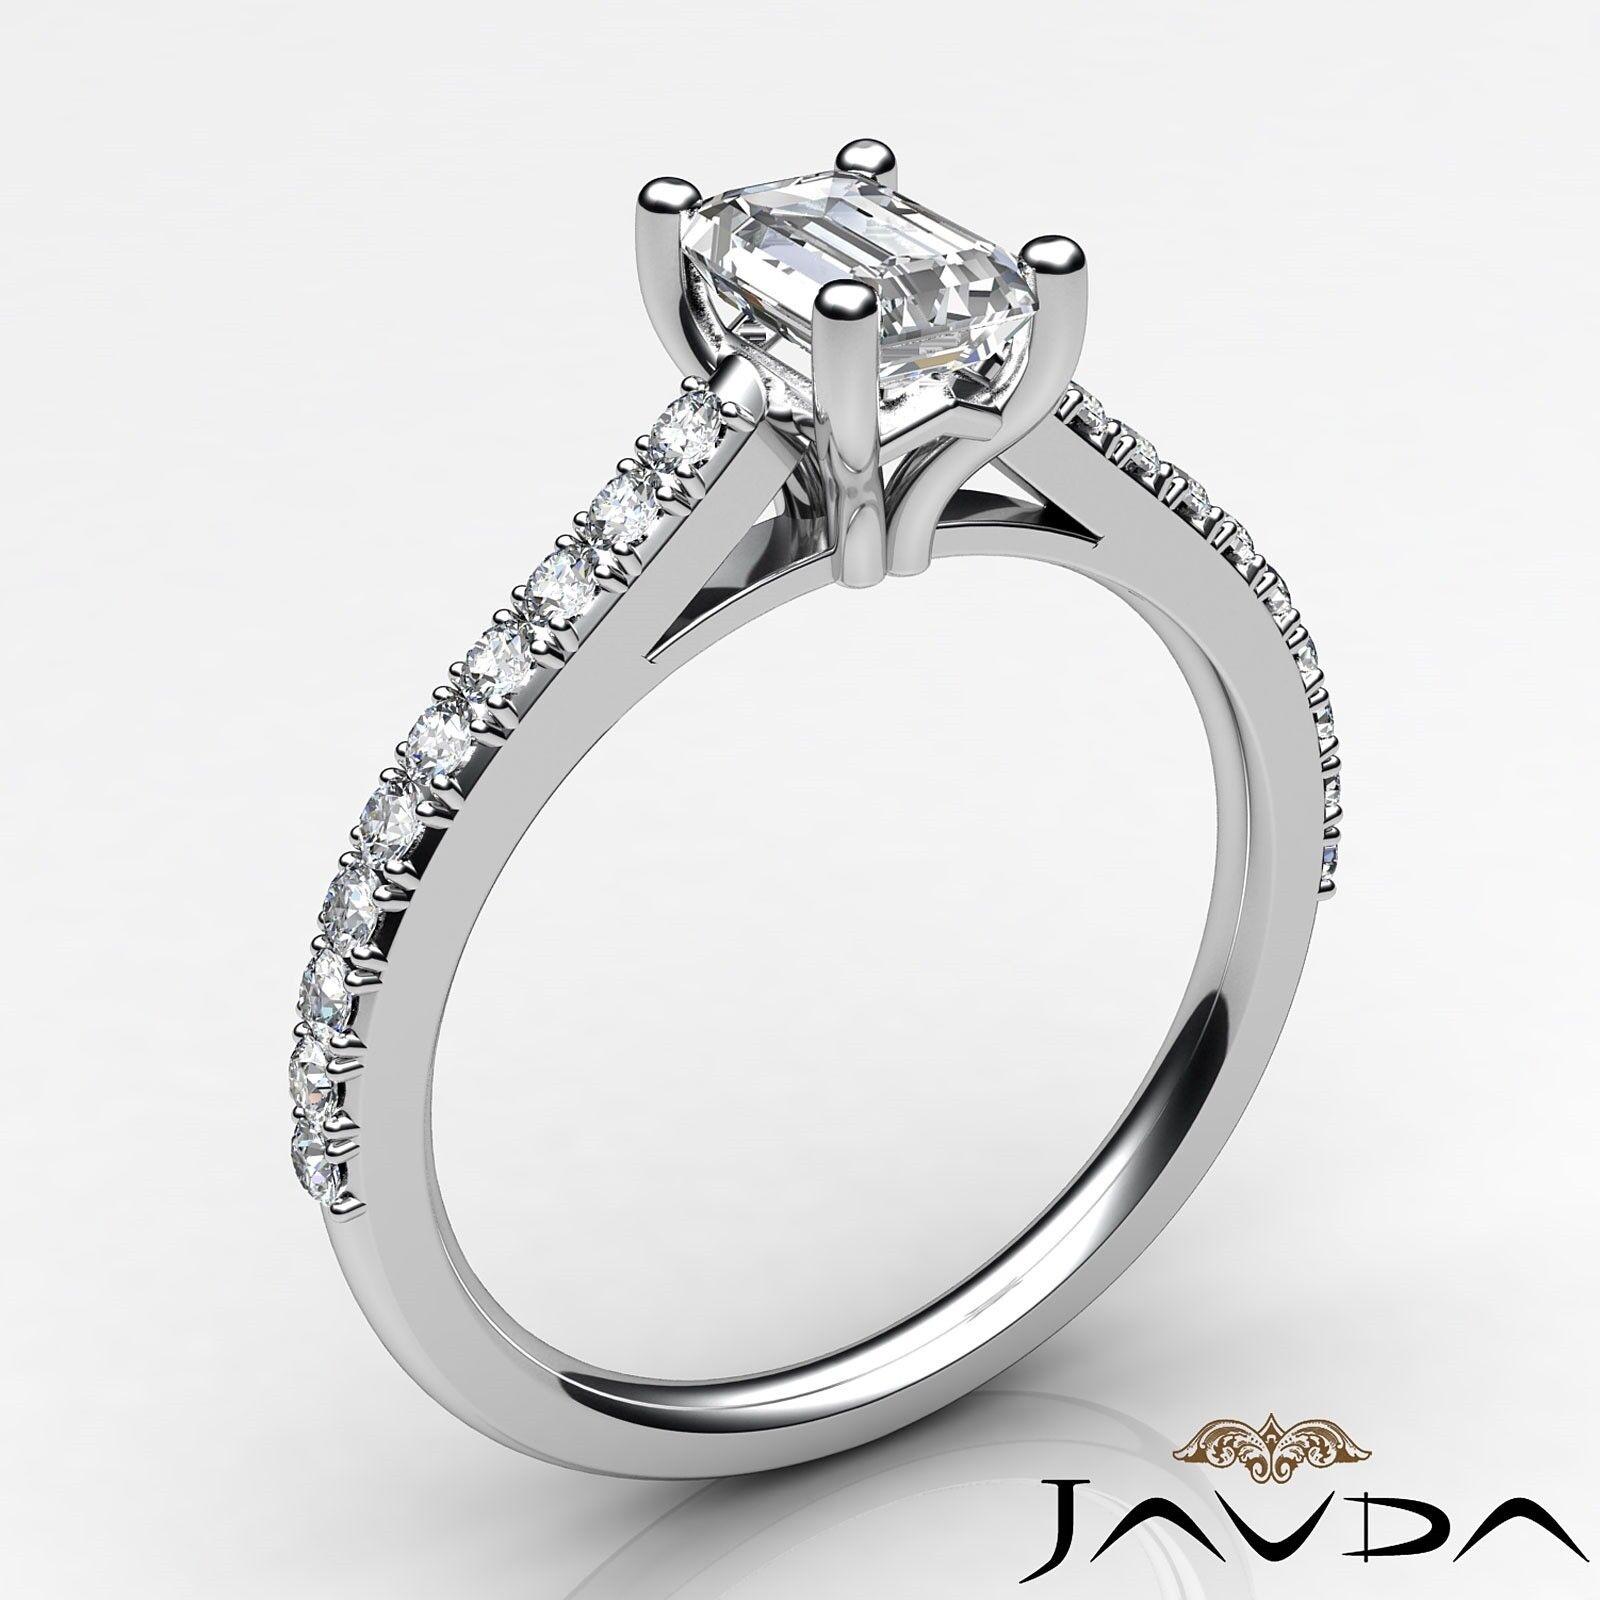 0.82ctw Classic Prong Set Emerald Diamond Engagement Ring GIA G-VVS2 White Gold 1